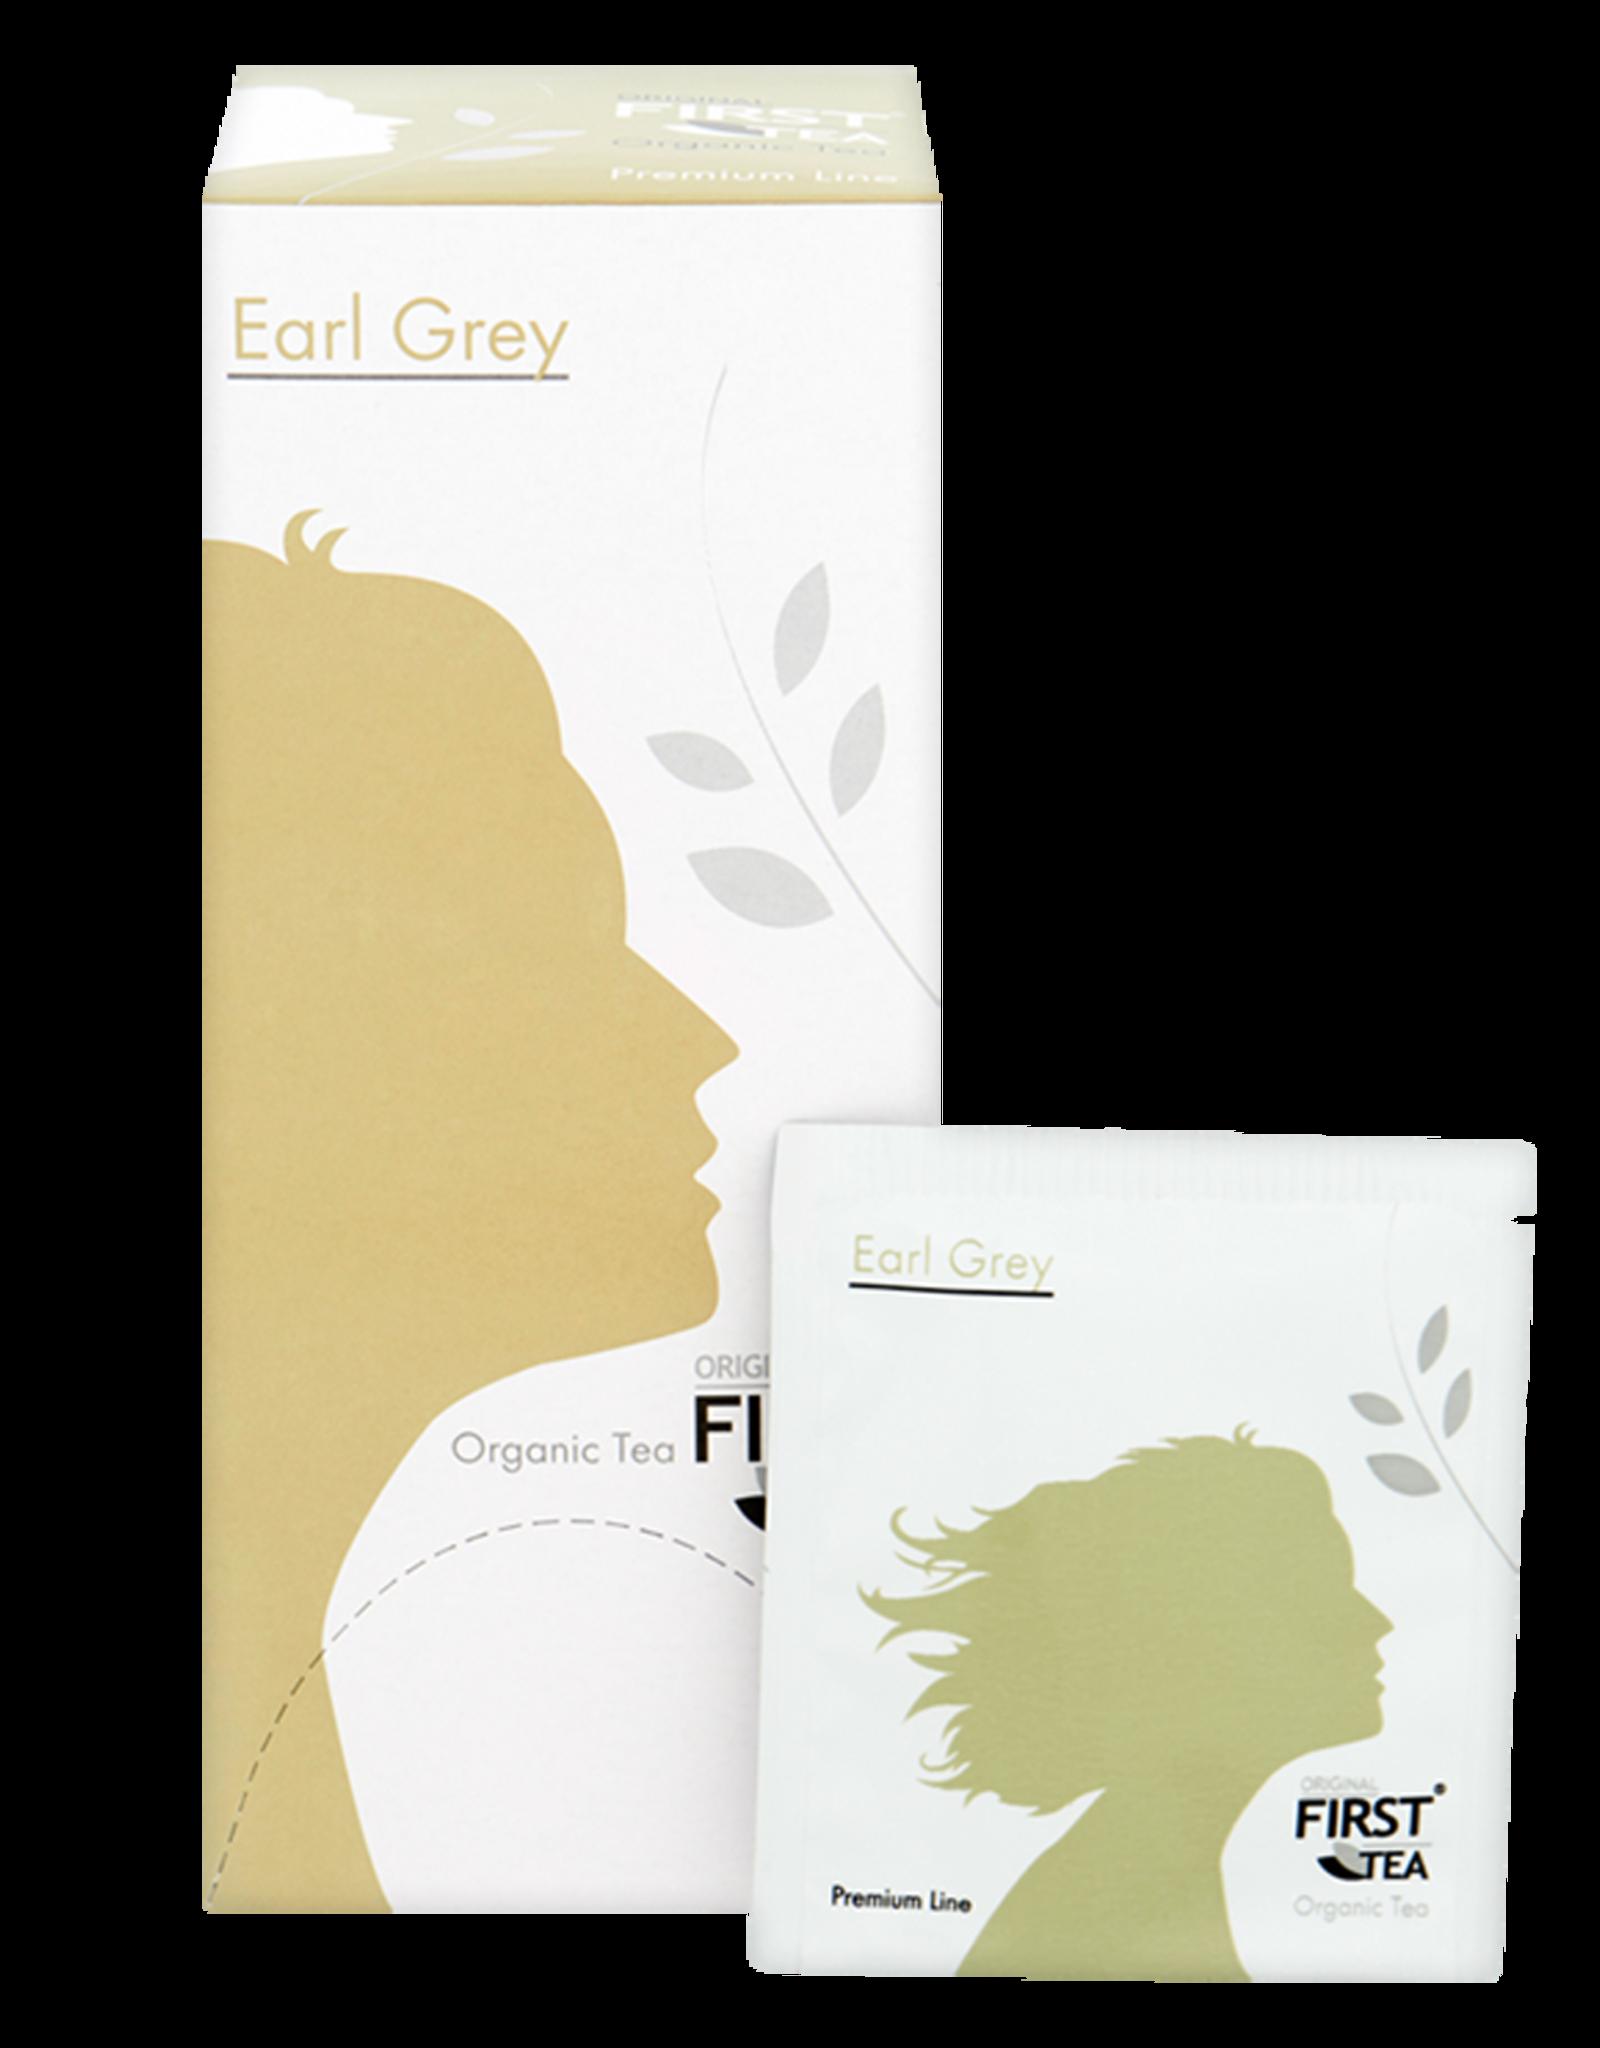 First Tea Premiumline Premium Line Earl Grey